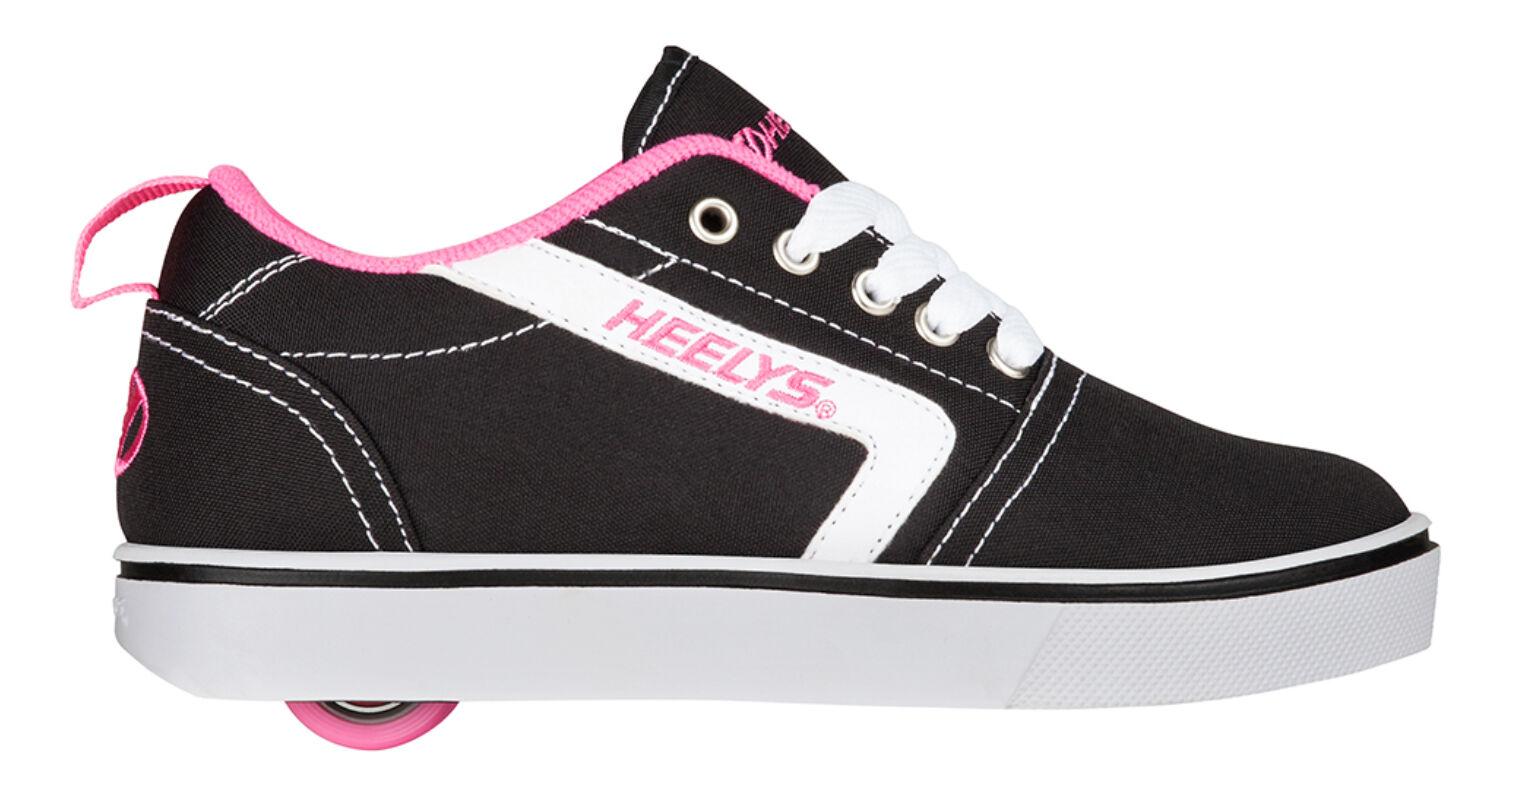 67fd62a7b2ba Heelys GR8 Pro black/white/pink - Gurulós cipők